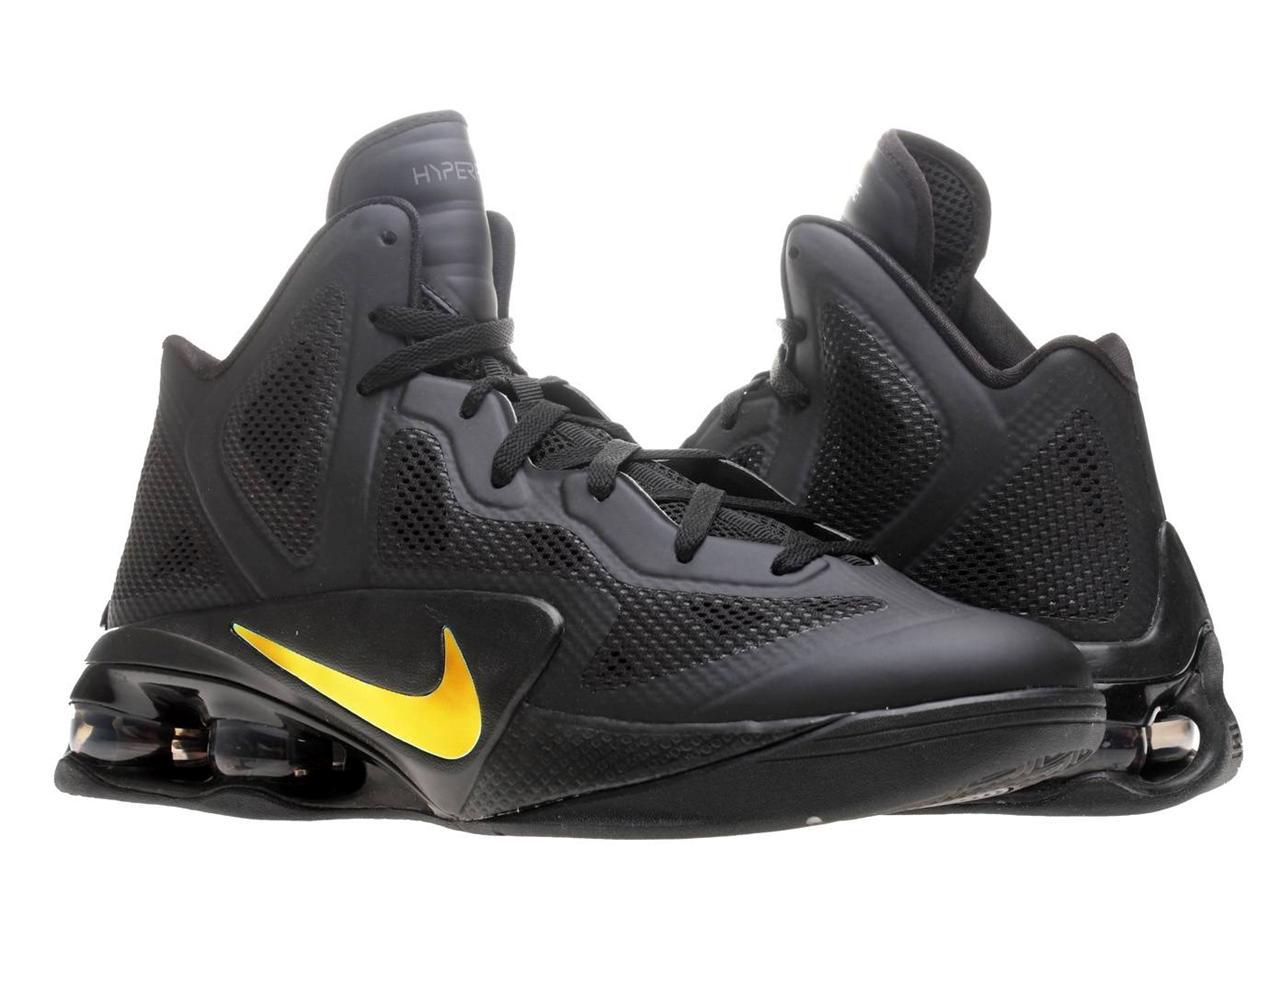 890a59e39b03 nike shox grey and maroon black gold Womens Nike Shox NZ EU ...